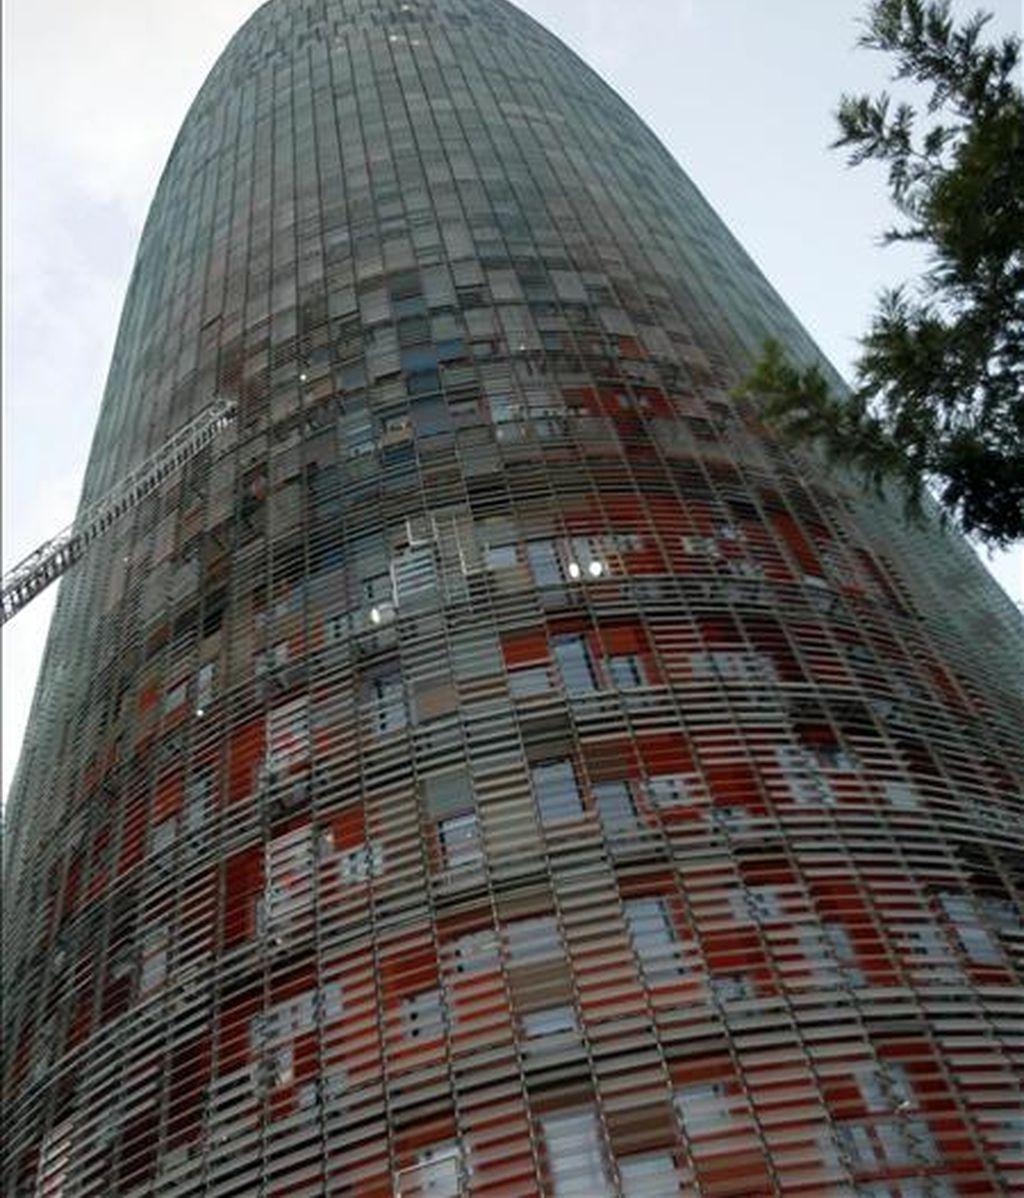 La Torre Agbar de Barcelona, sede corporativa de Aguas de Barcelona. EFE/Archivo